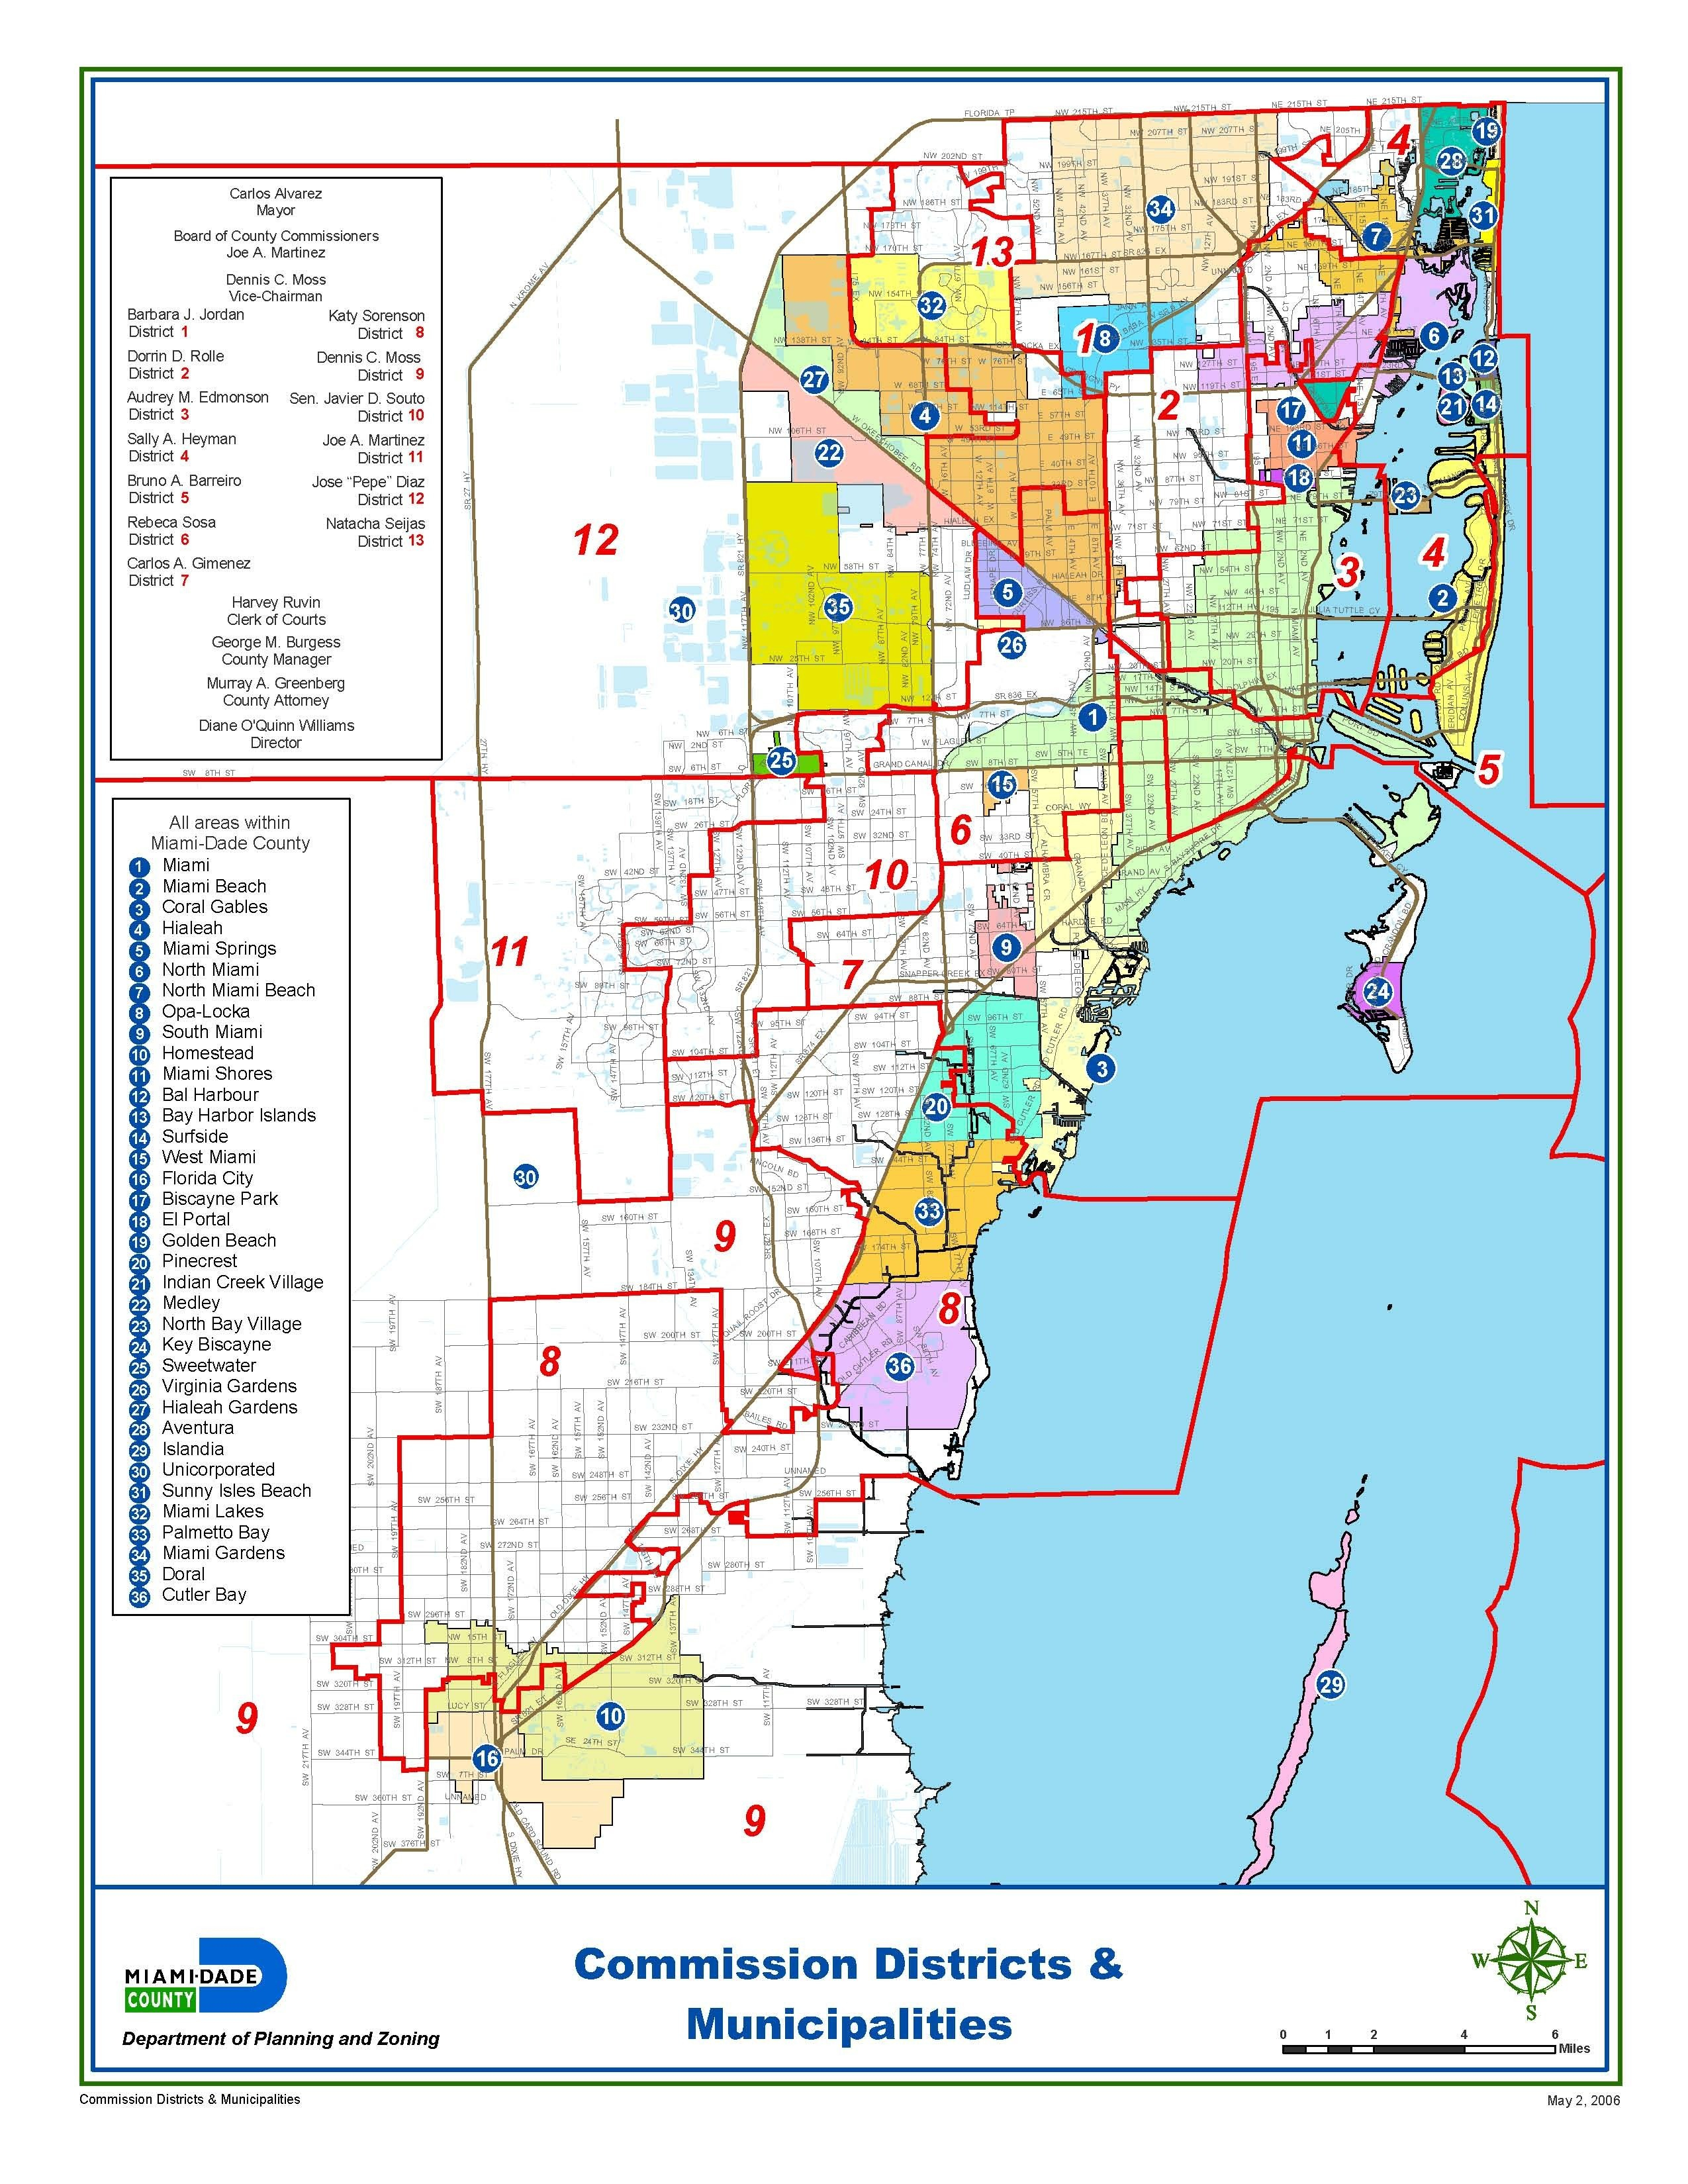 United States Map Miami Florida New United States Map Naples Florida - Show Me A Map Of Naples Florida